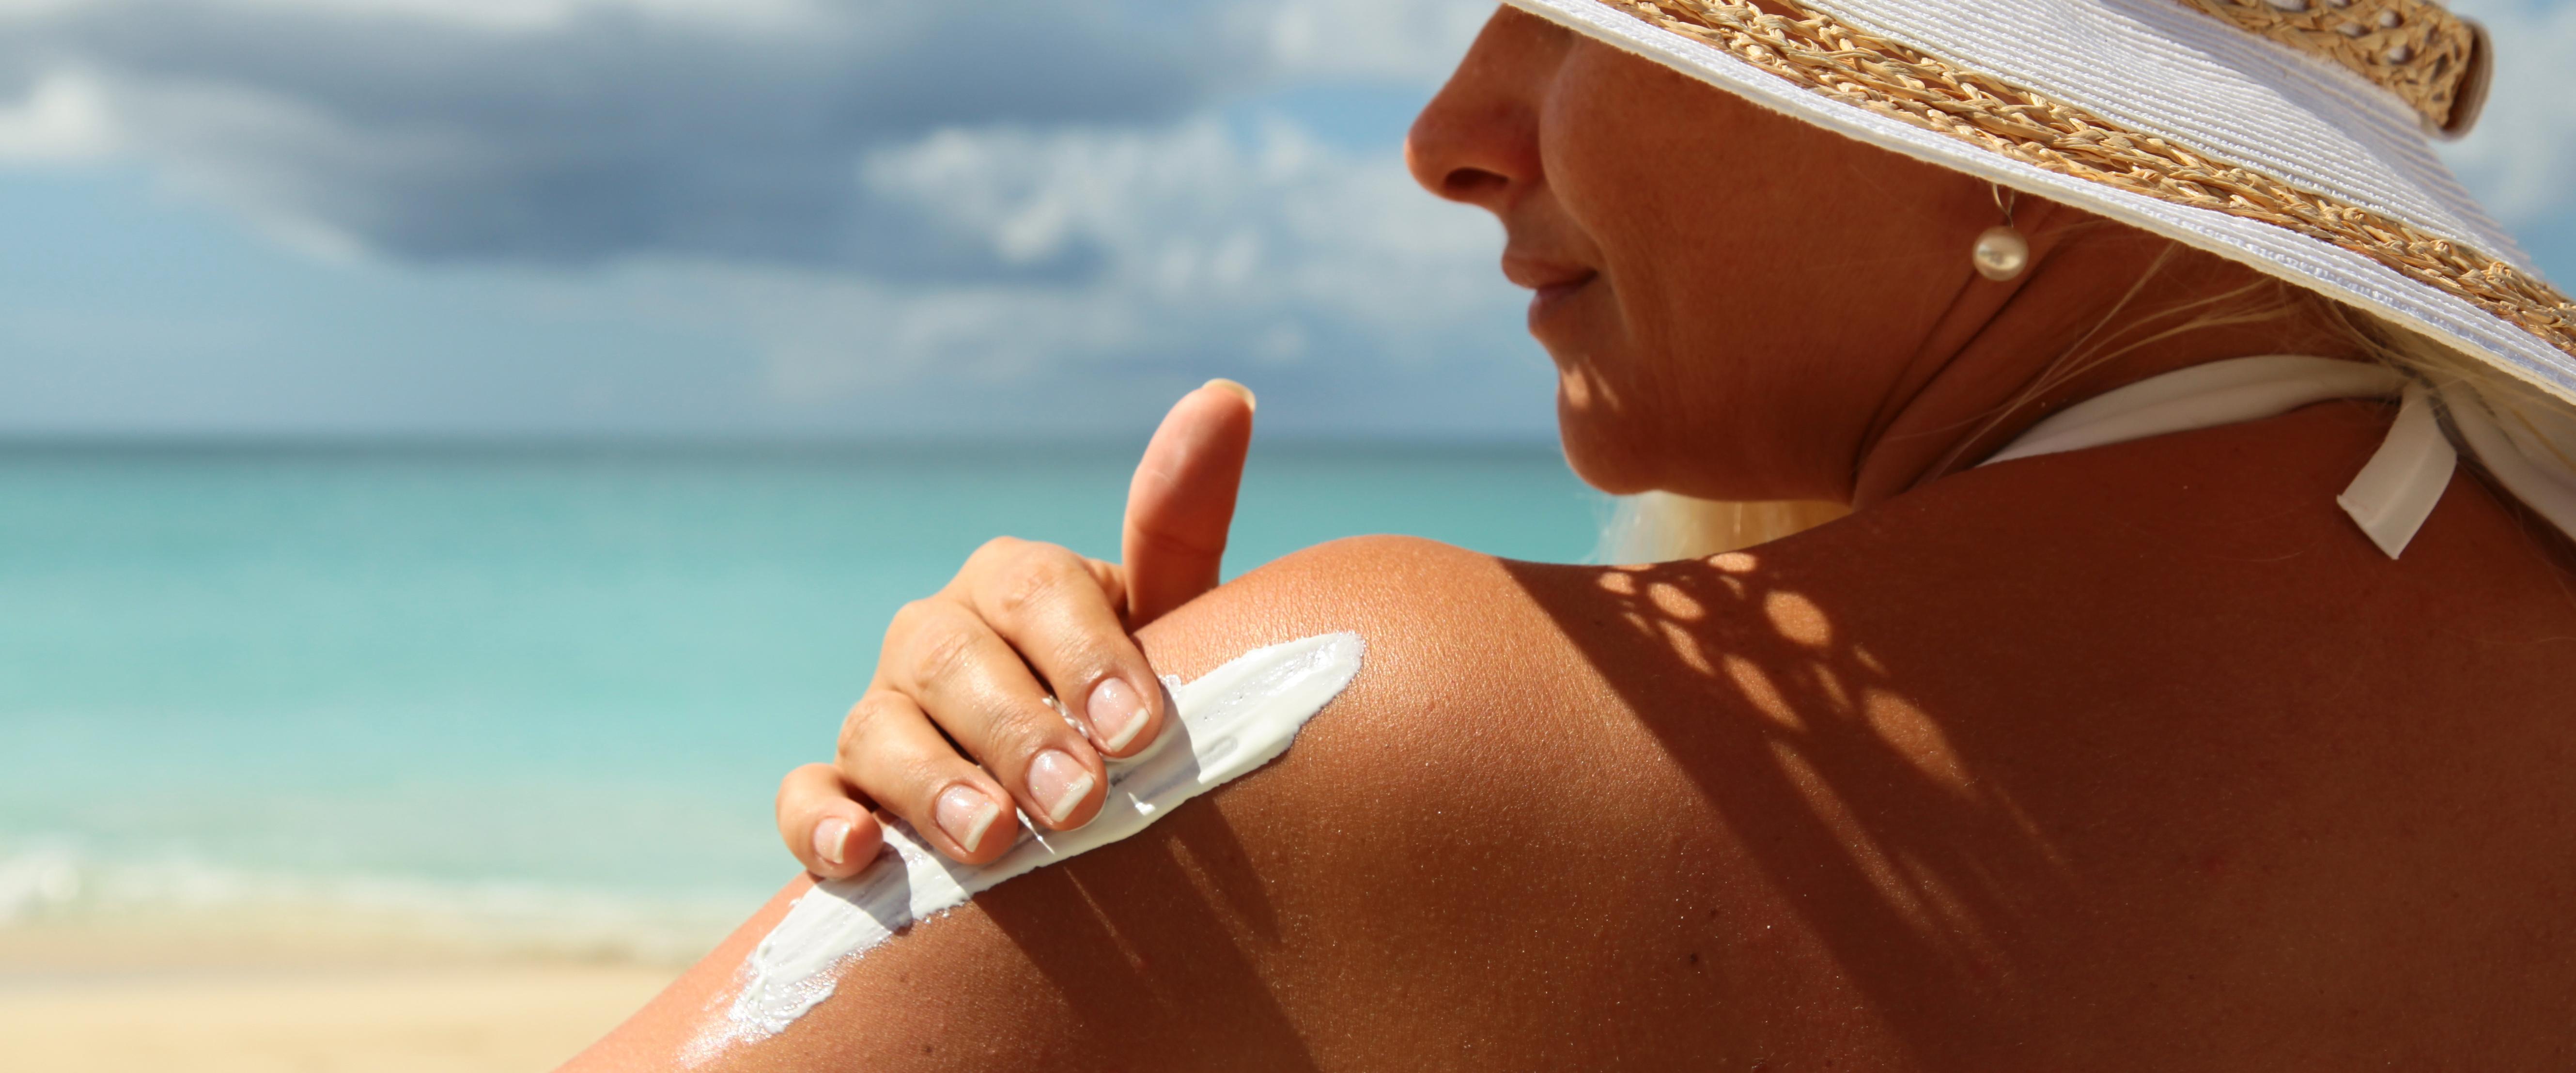 CBD for sunburn